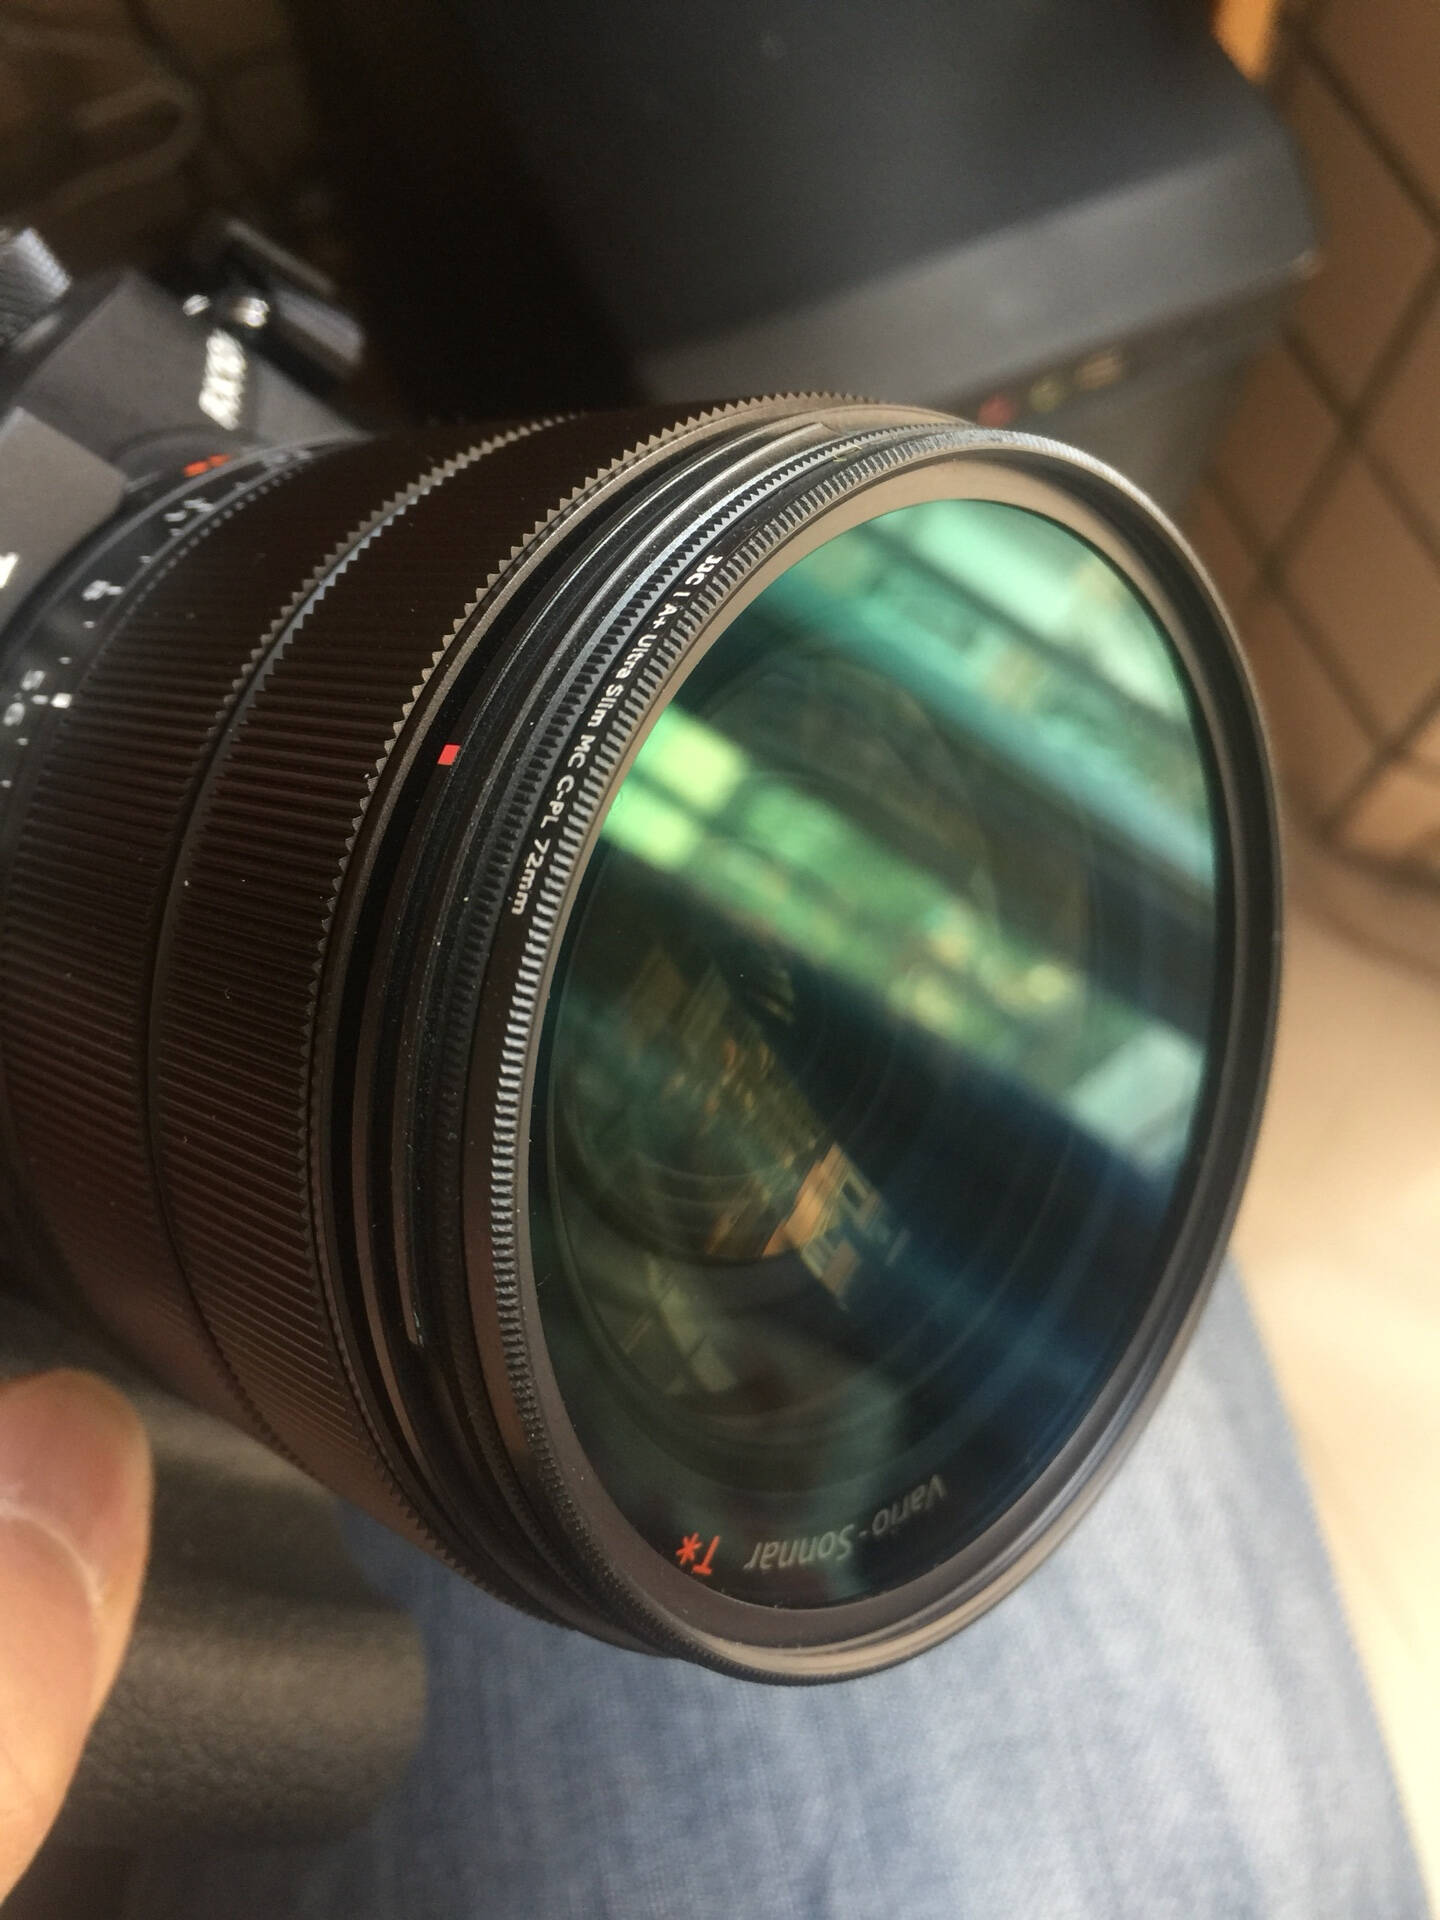 JJC偏振镜CPL适用于尼康佳能索尼富士40.54952586267727782mm52mm